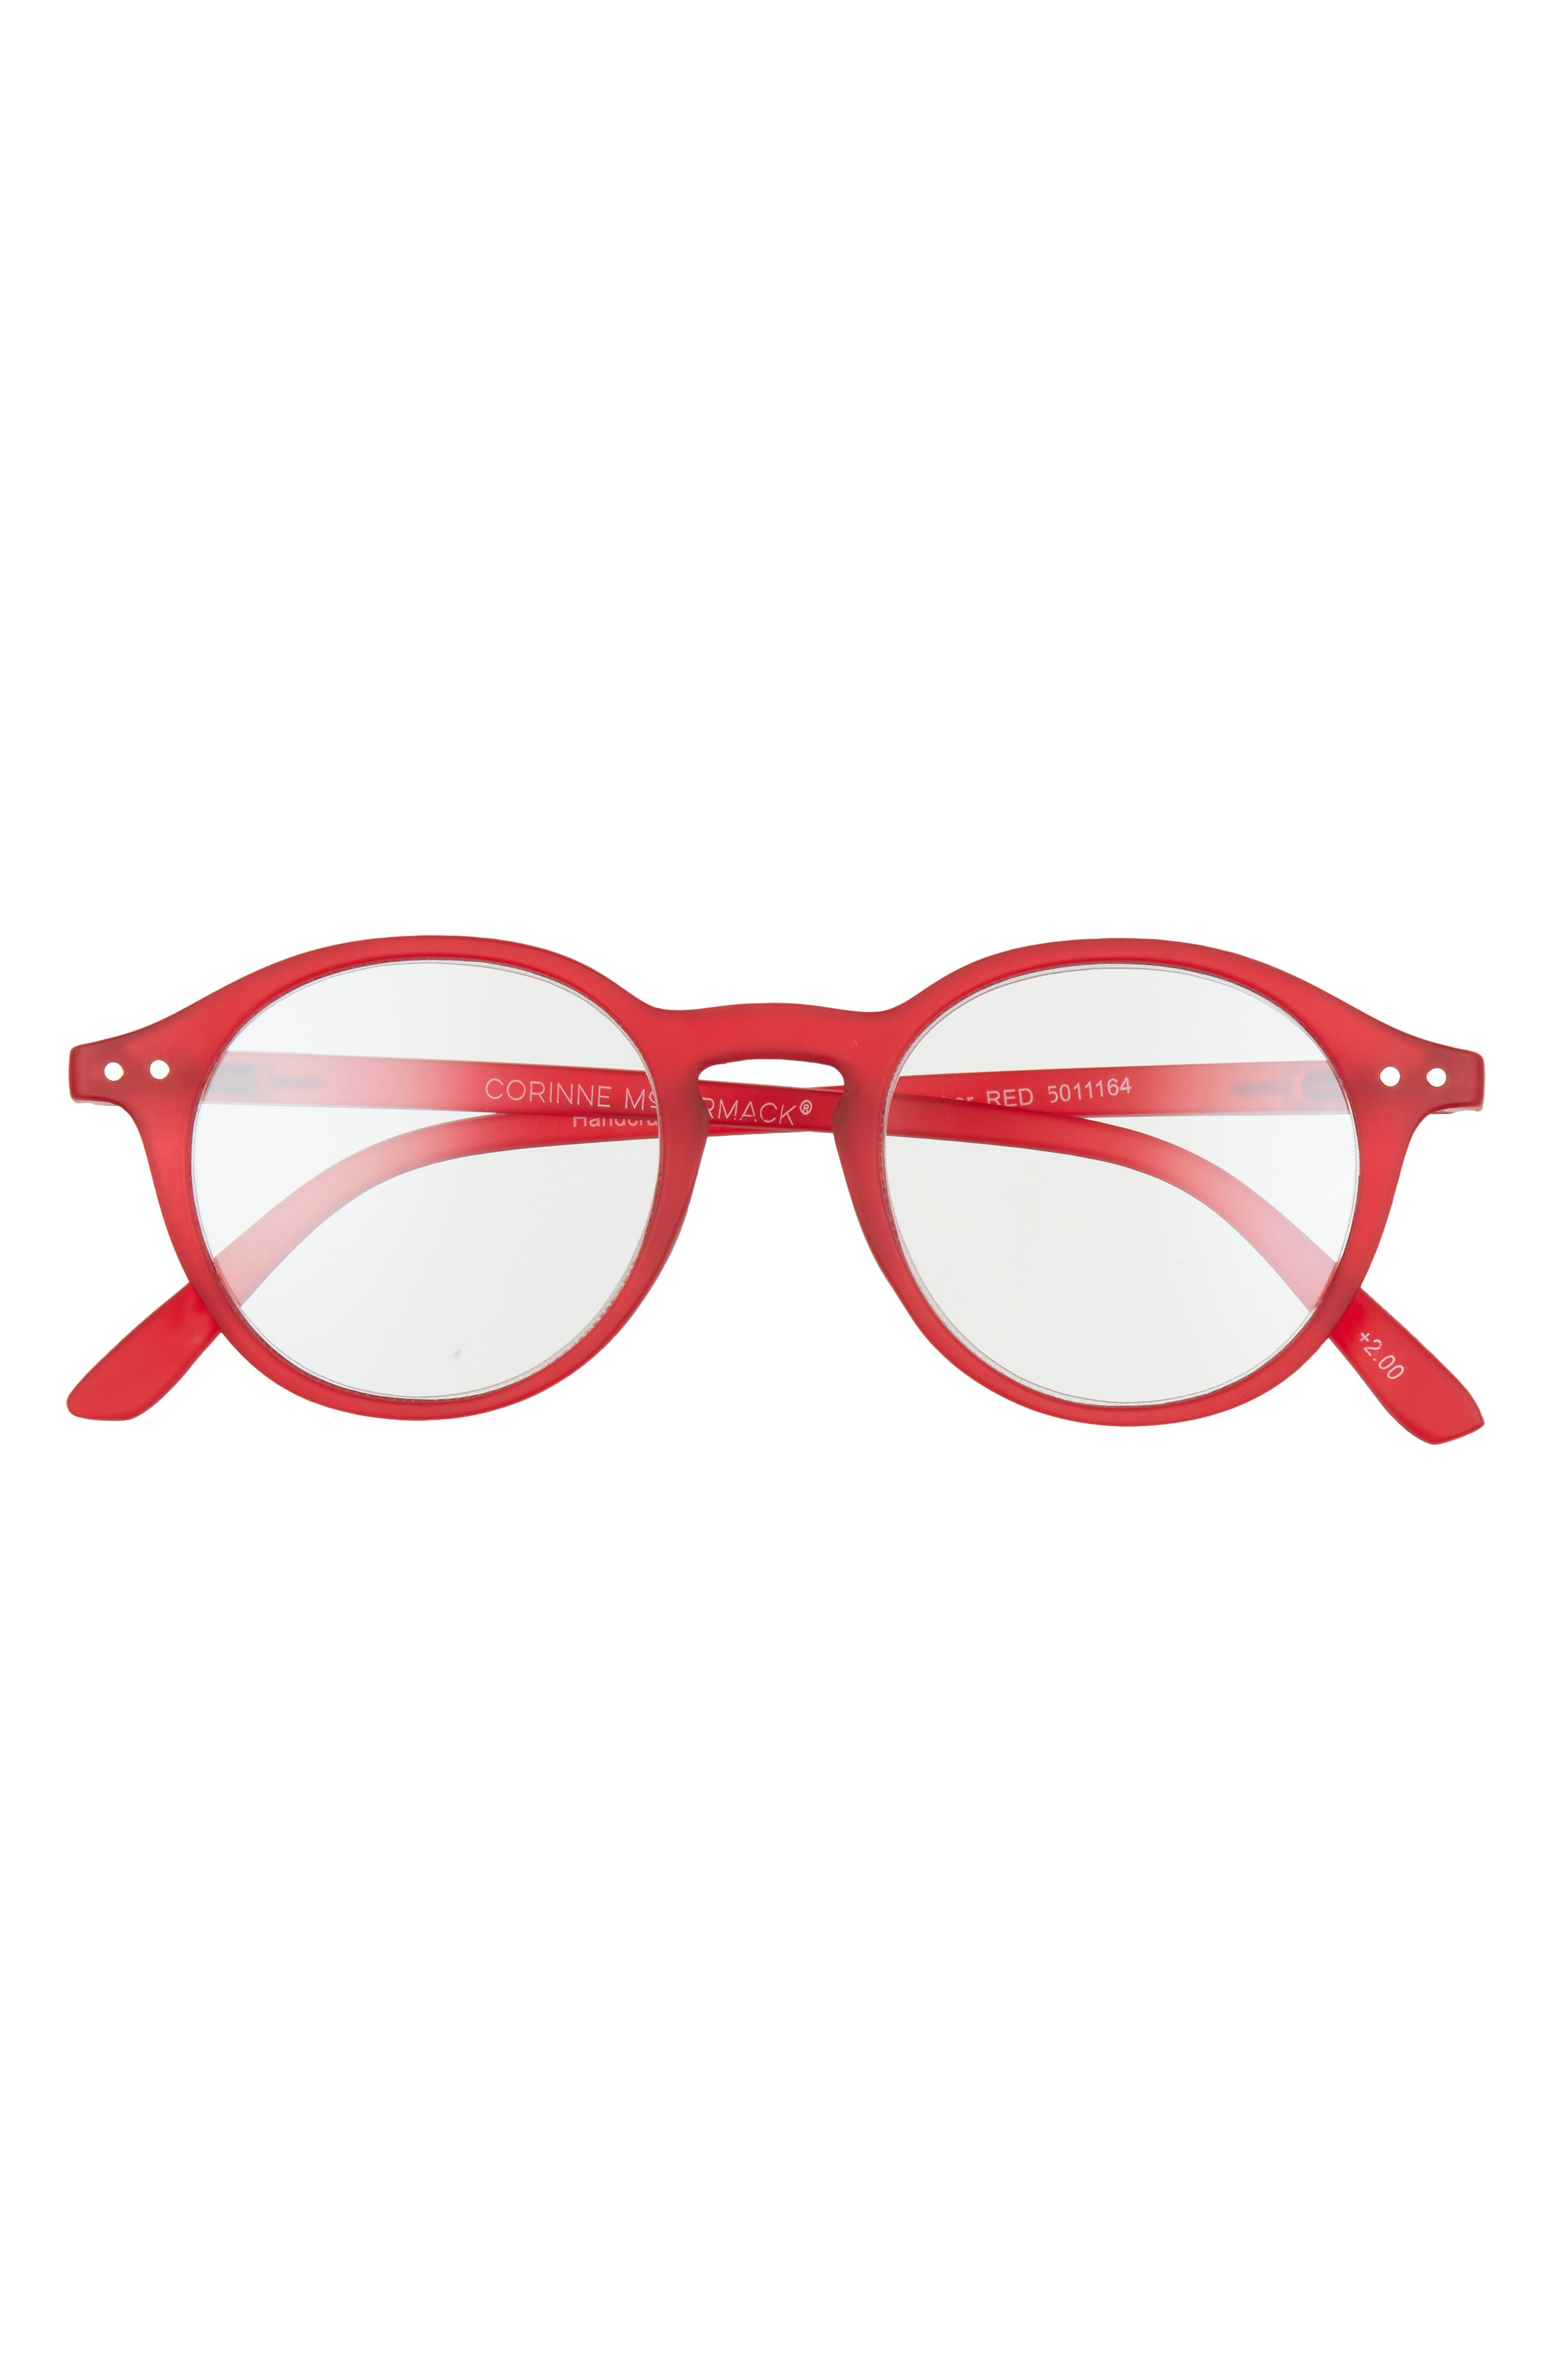 Parker 47mm Blue Light Blocking Reading Glasses